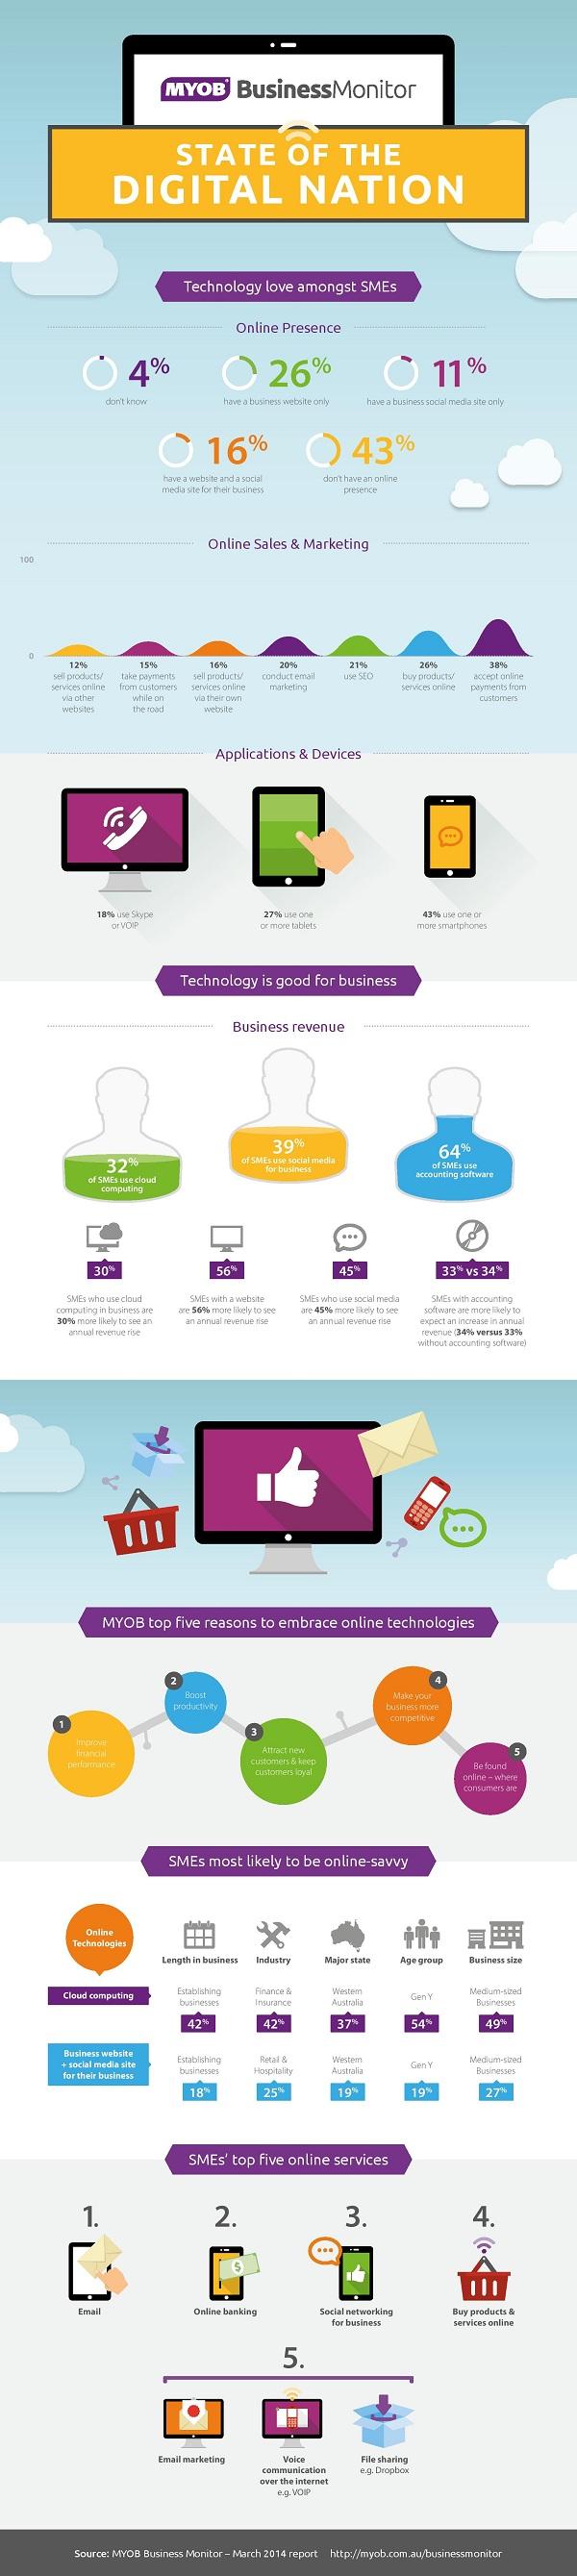 MYOB Infographic